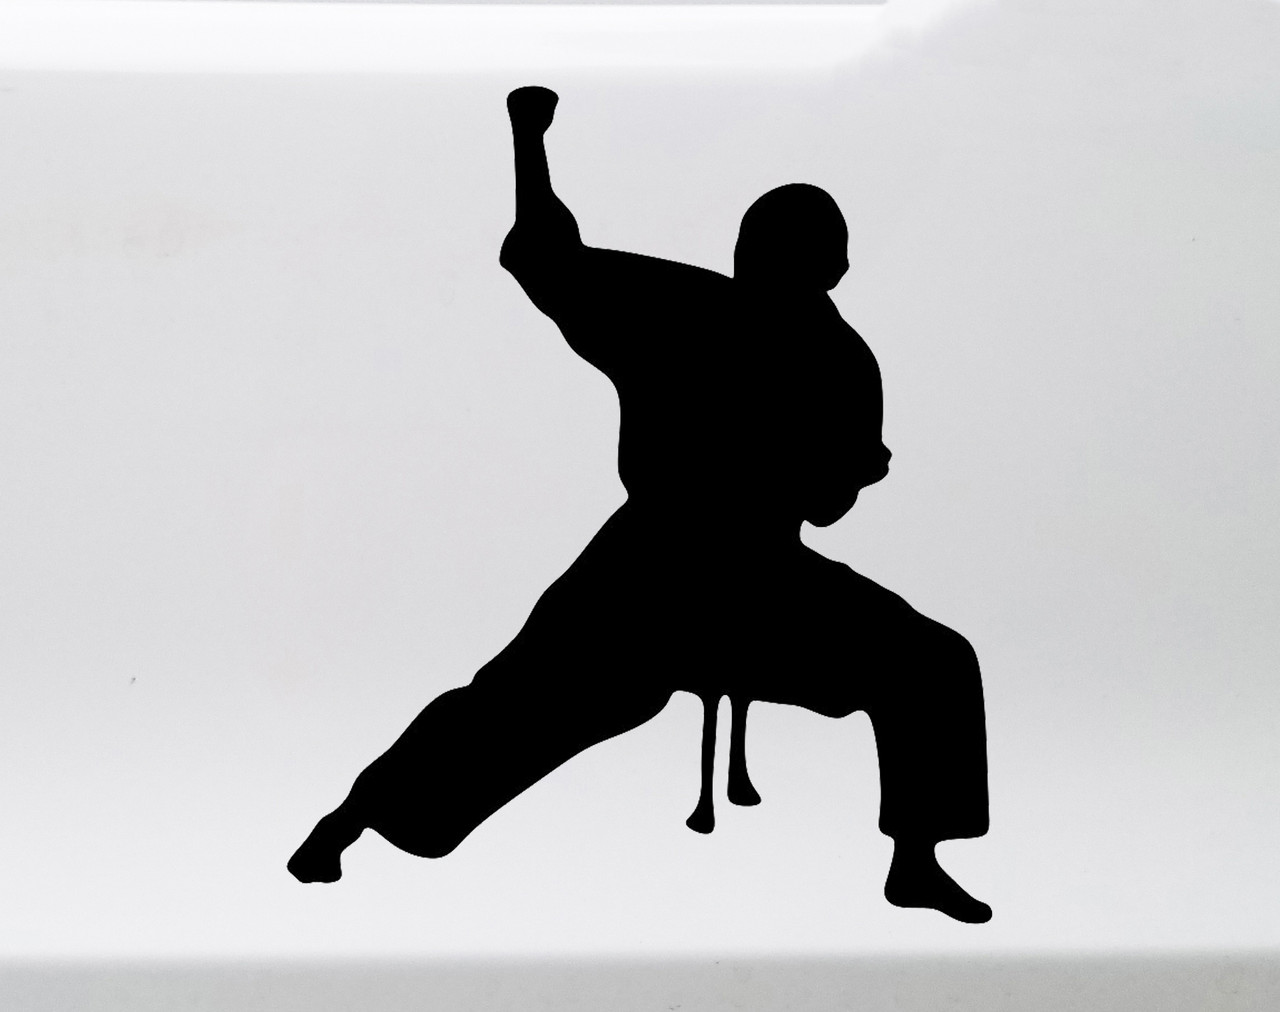 Karate Boy Vinyl Decal V2 - Man Judo Taekwondo Martial Arts - Die Cut Sticker